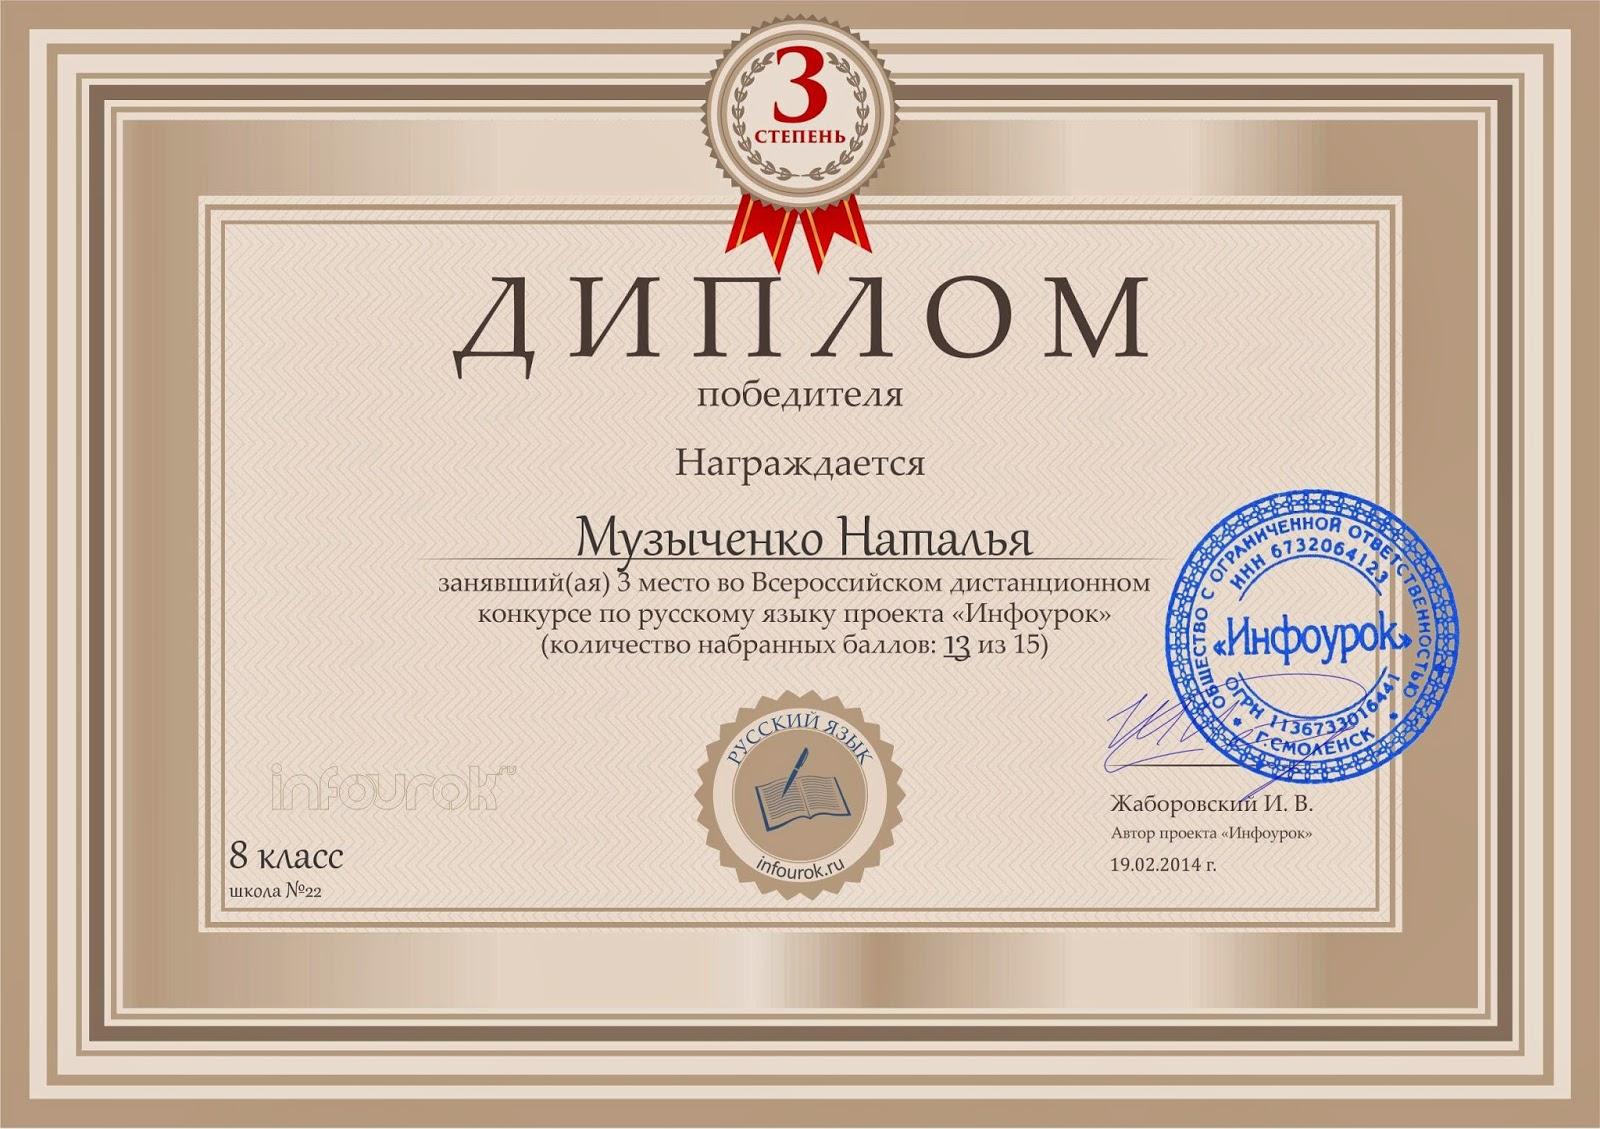 Учитель словесности Диплом за iii место на дистанционном конкурсе  Диплом за iii место на дистанционном конкурсе по русскому языку Инфоурок